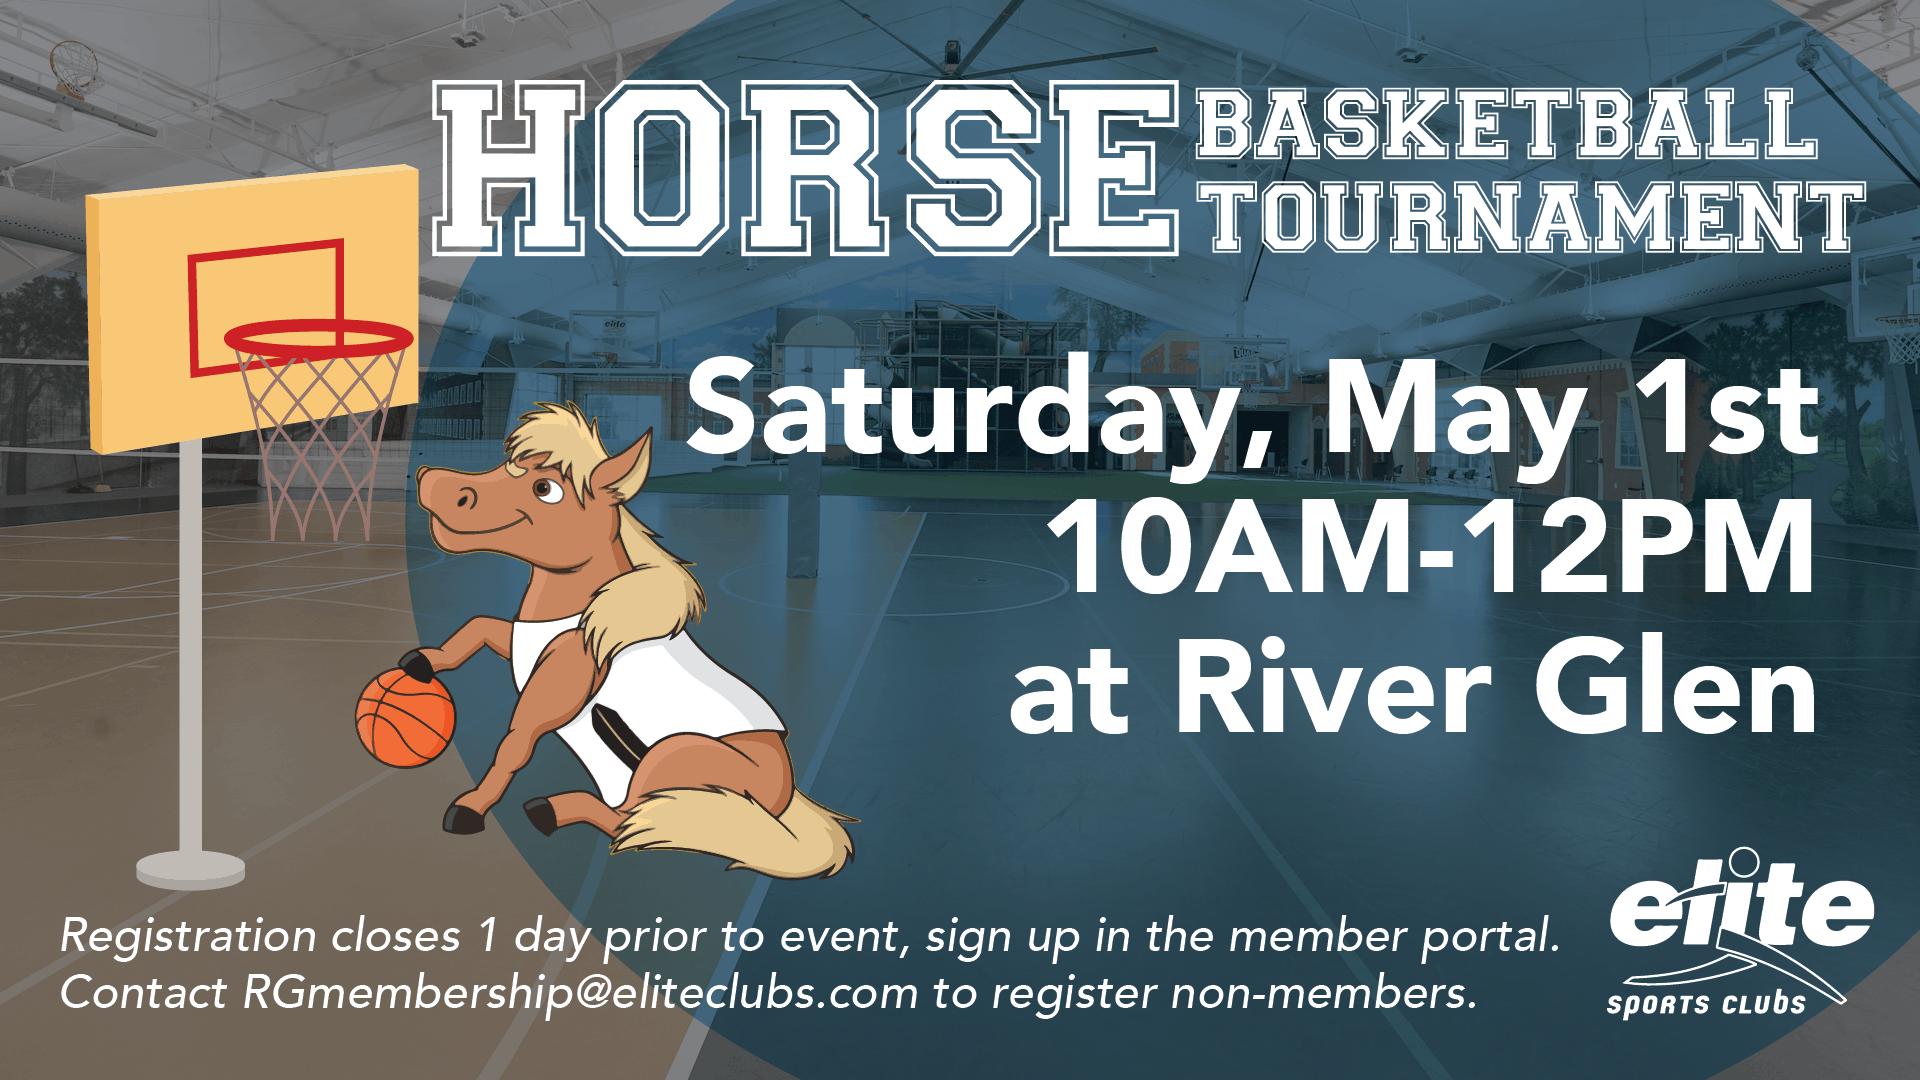 Horse Basketball Tournament - Elite River Glen - May 2021